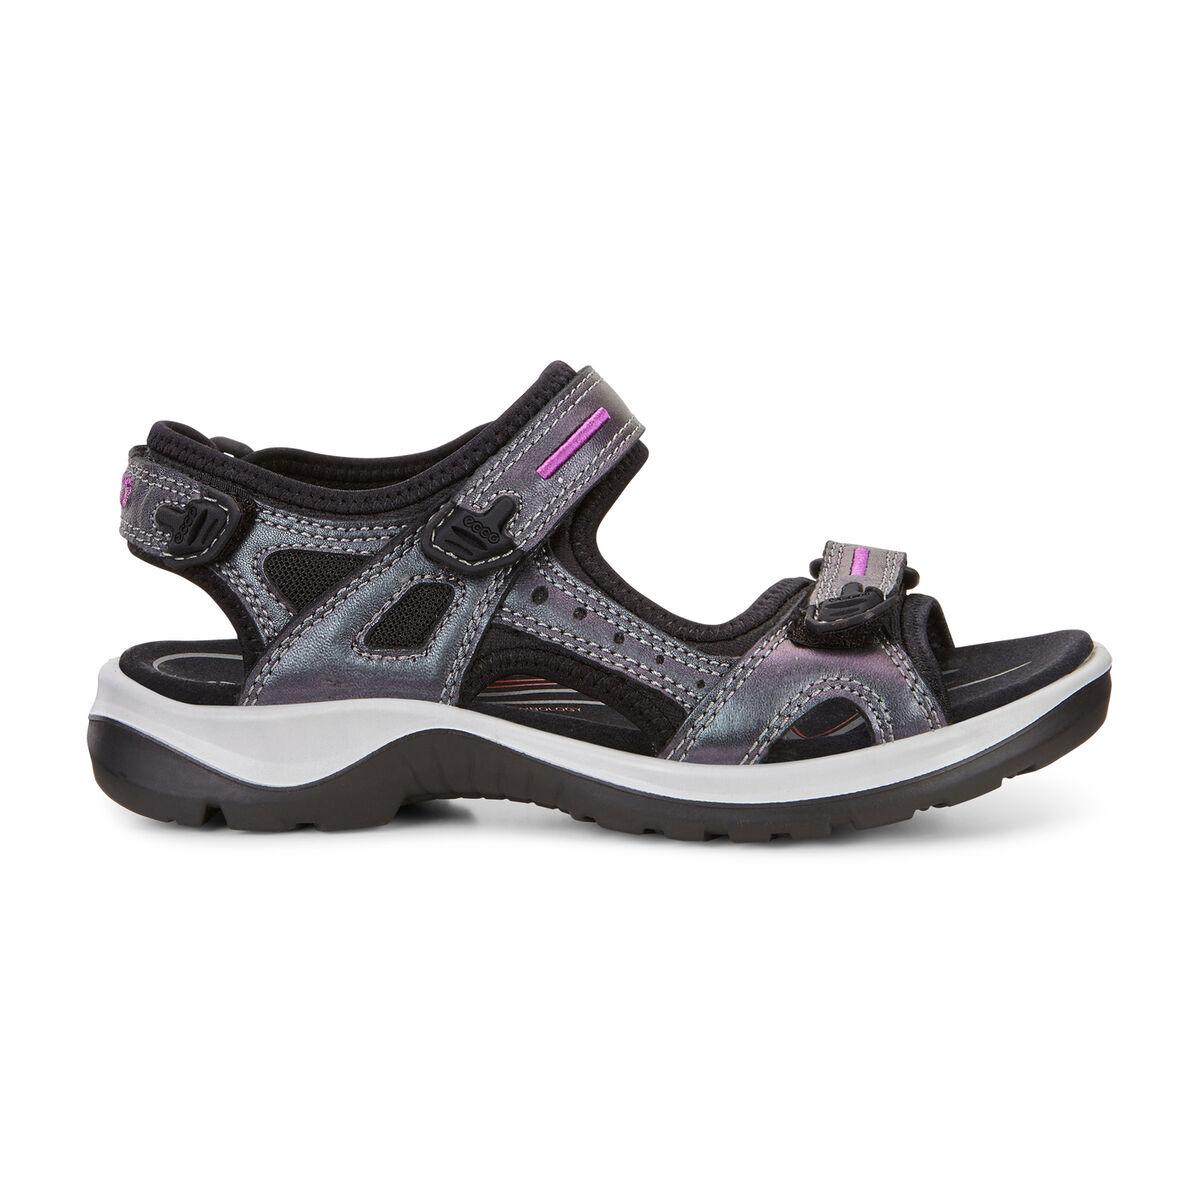 17f6e8ecf7a7 Images. Yucatan Women  39 s Sandal - Multi